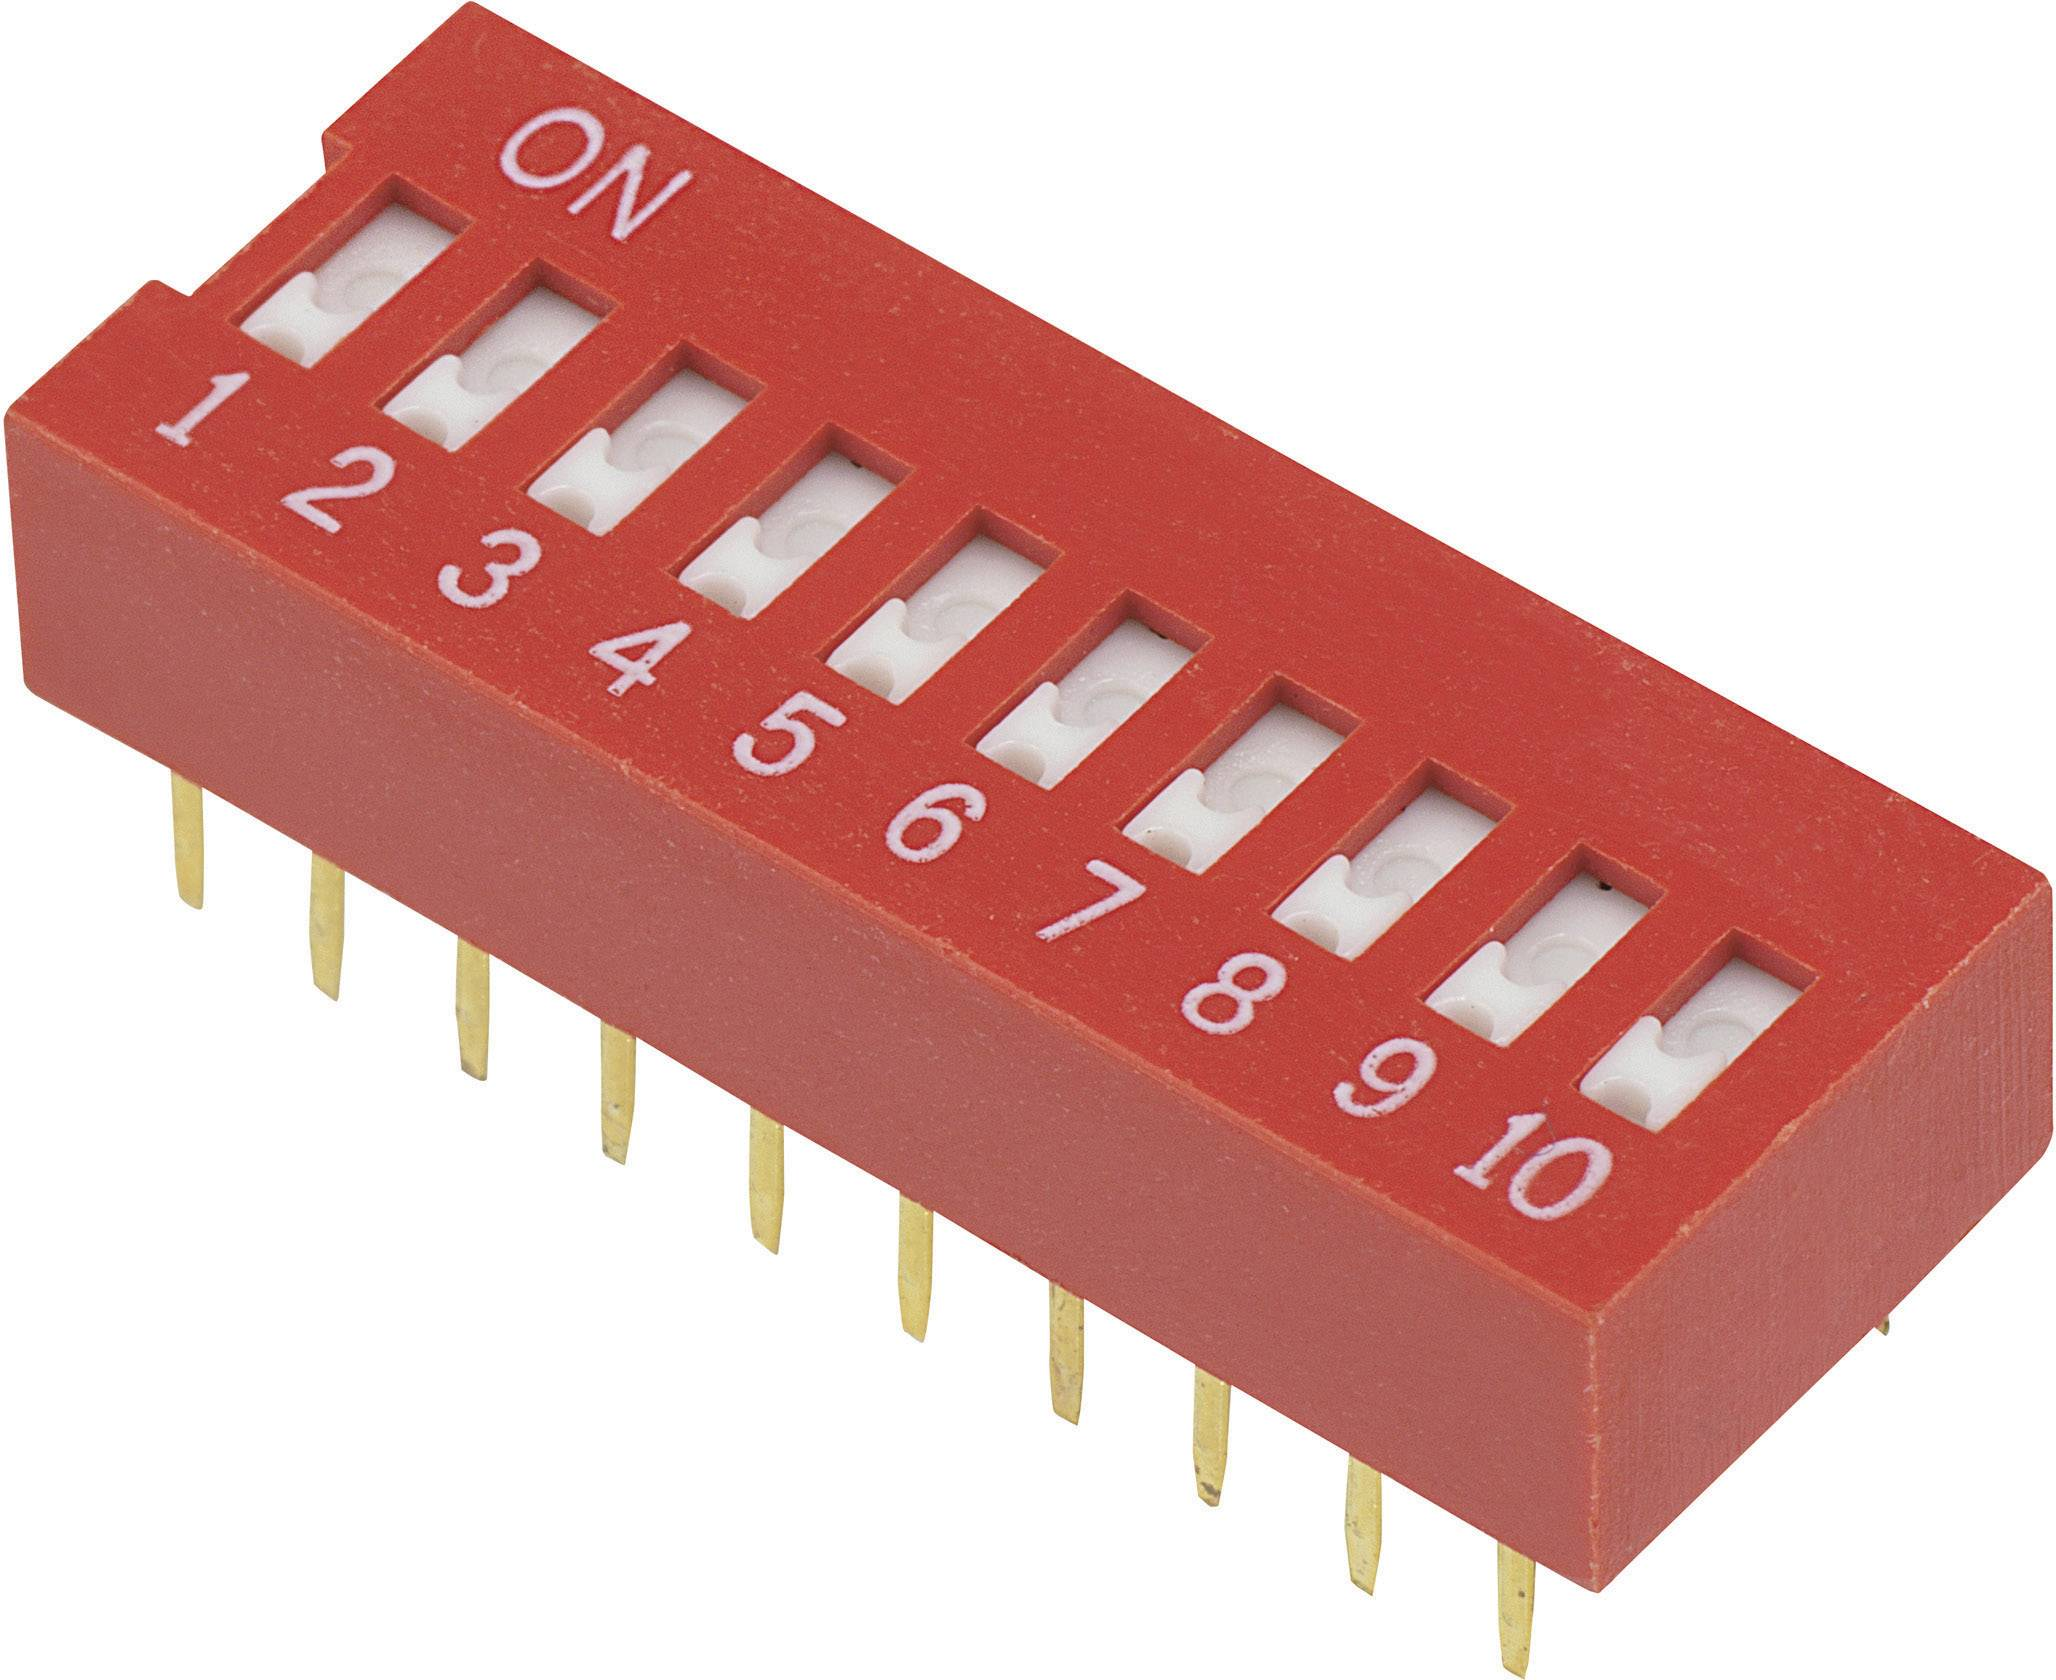 DIP spínač DSR-10, (š x v) 9,9 mm x 5,7 mm